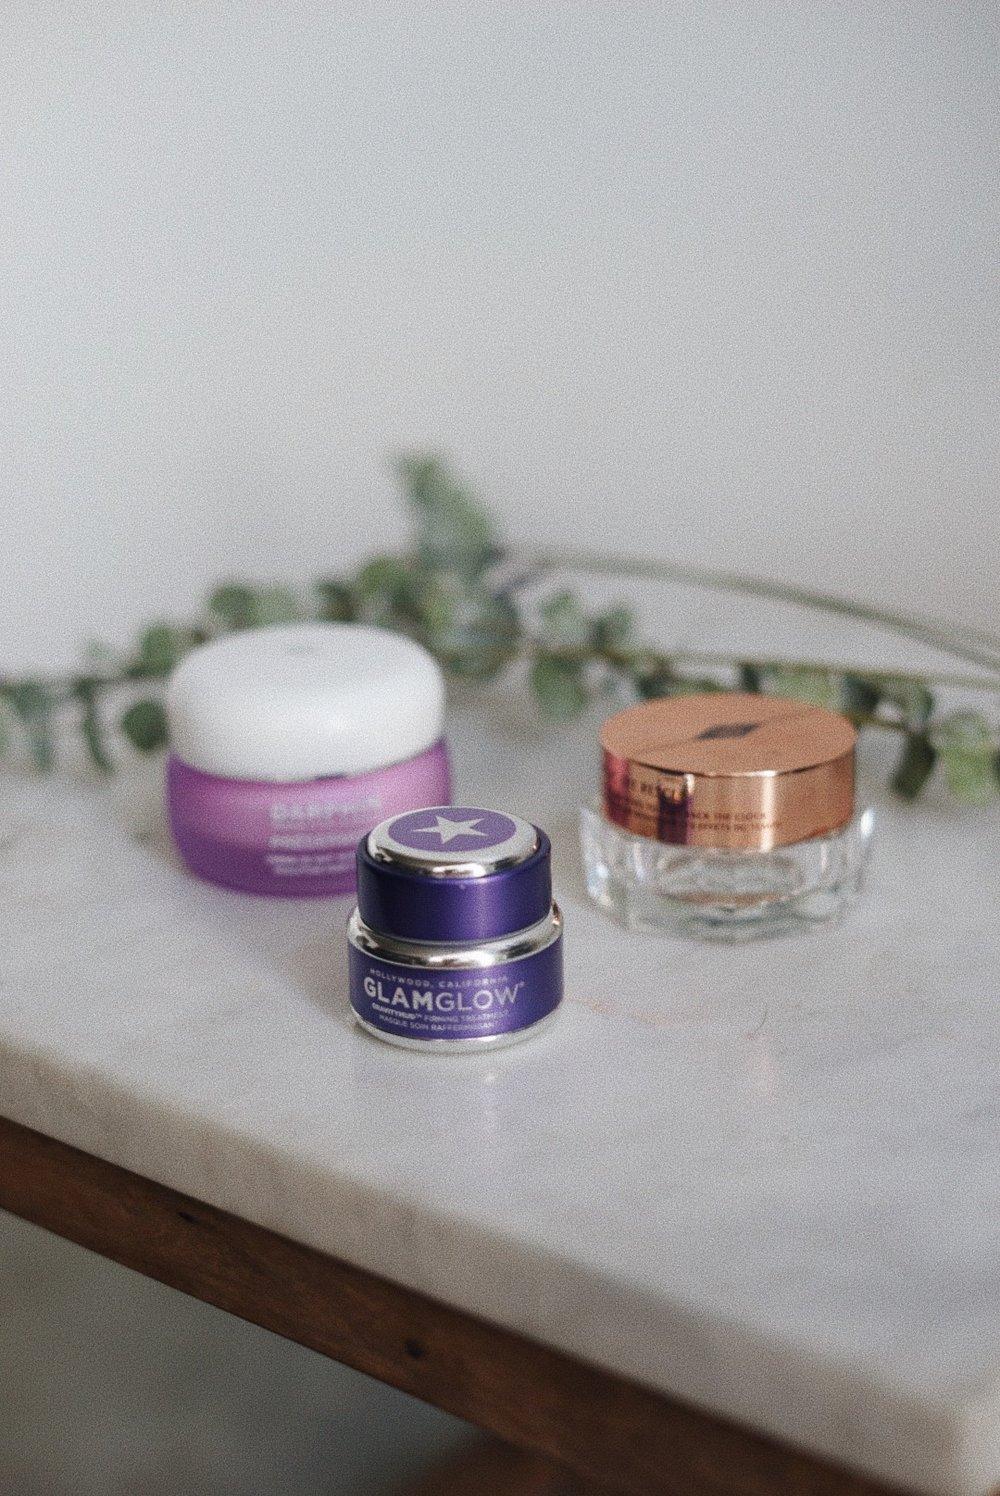 Night Products - Glamglow Gravitymud Firming Treatment Charlotte Tilbury Magic Eye RescueDarphin Night Cream